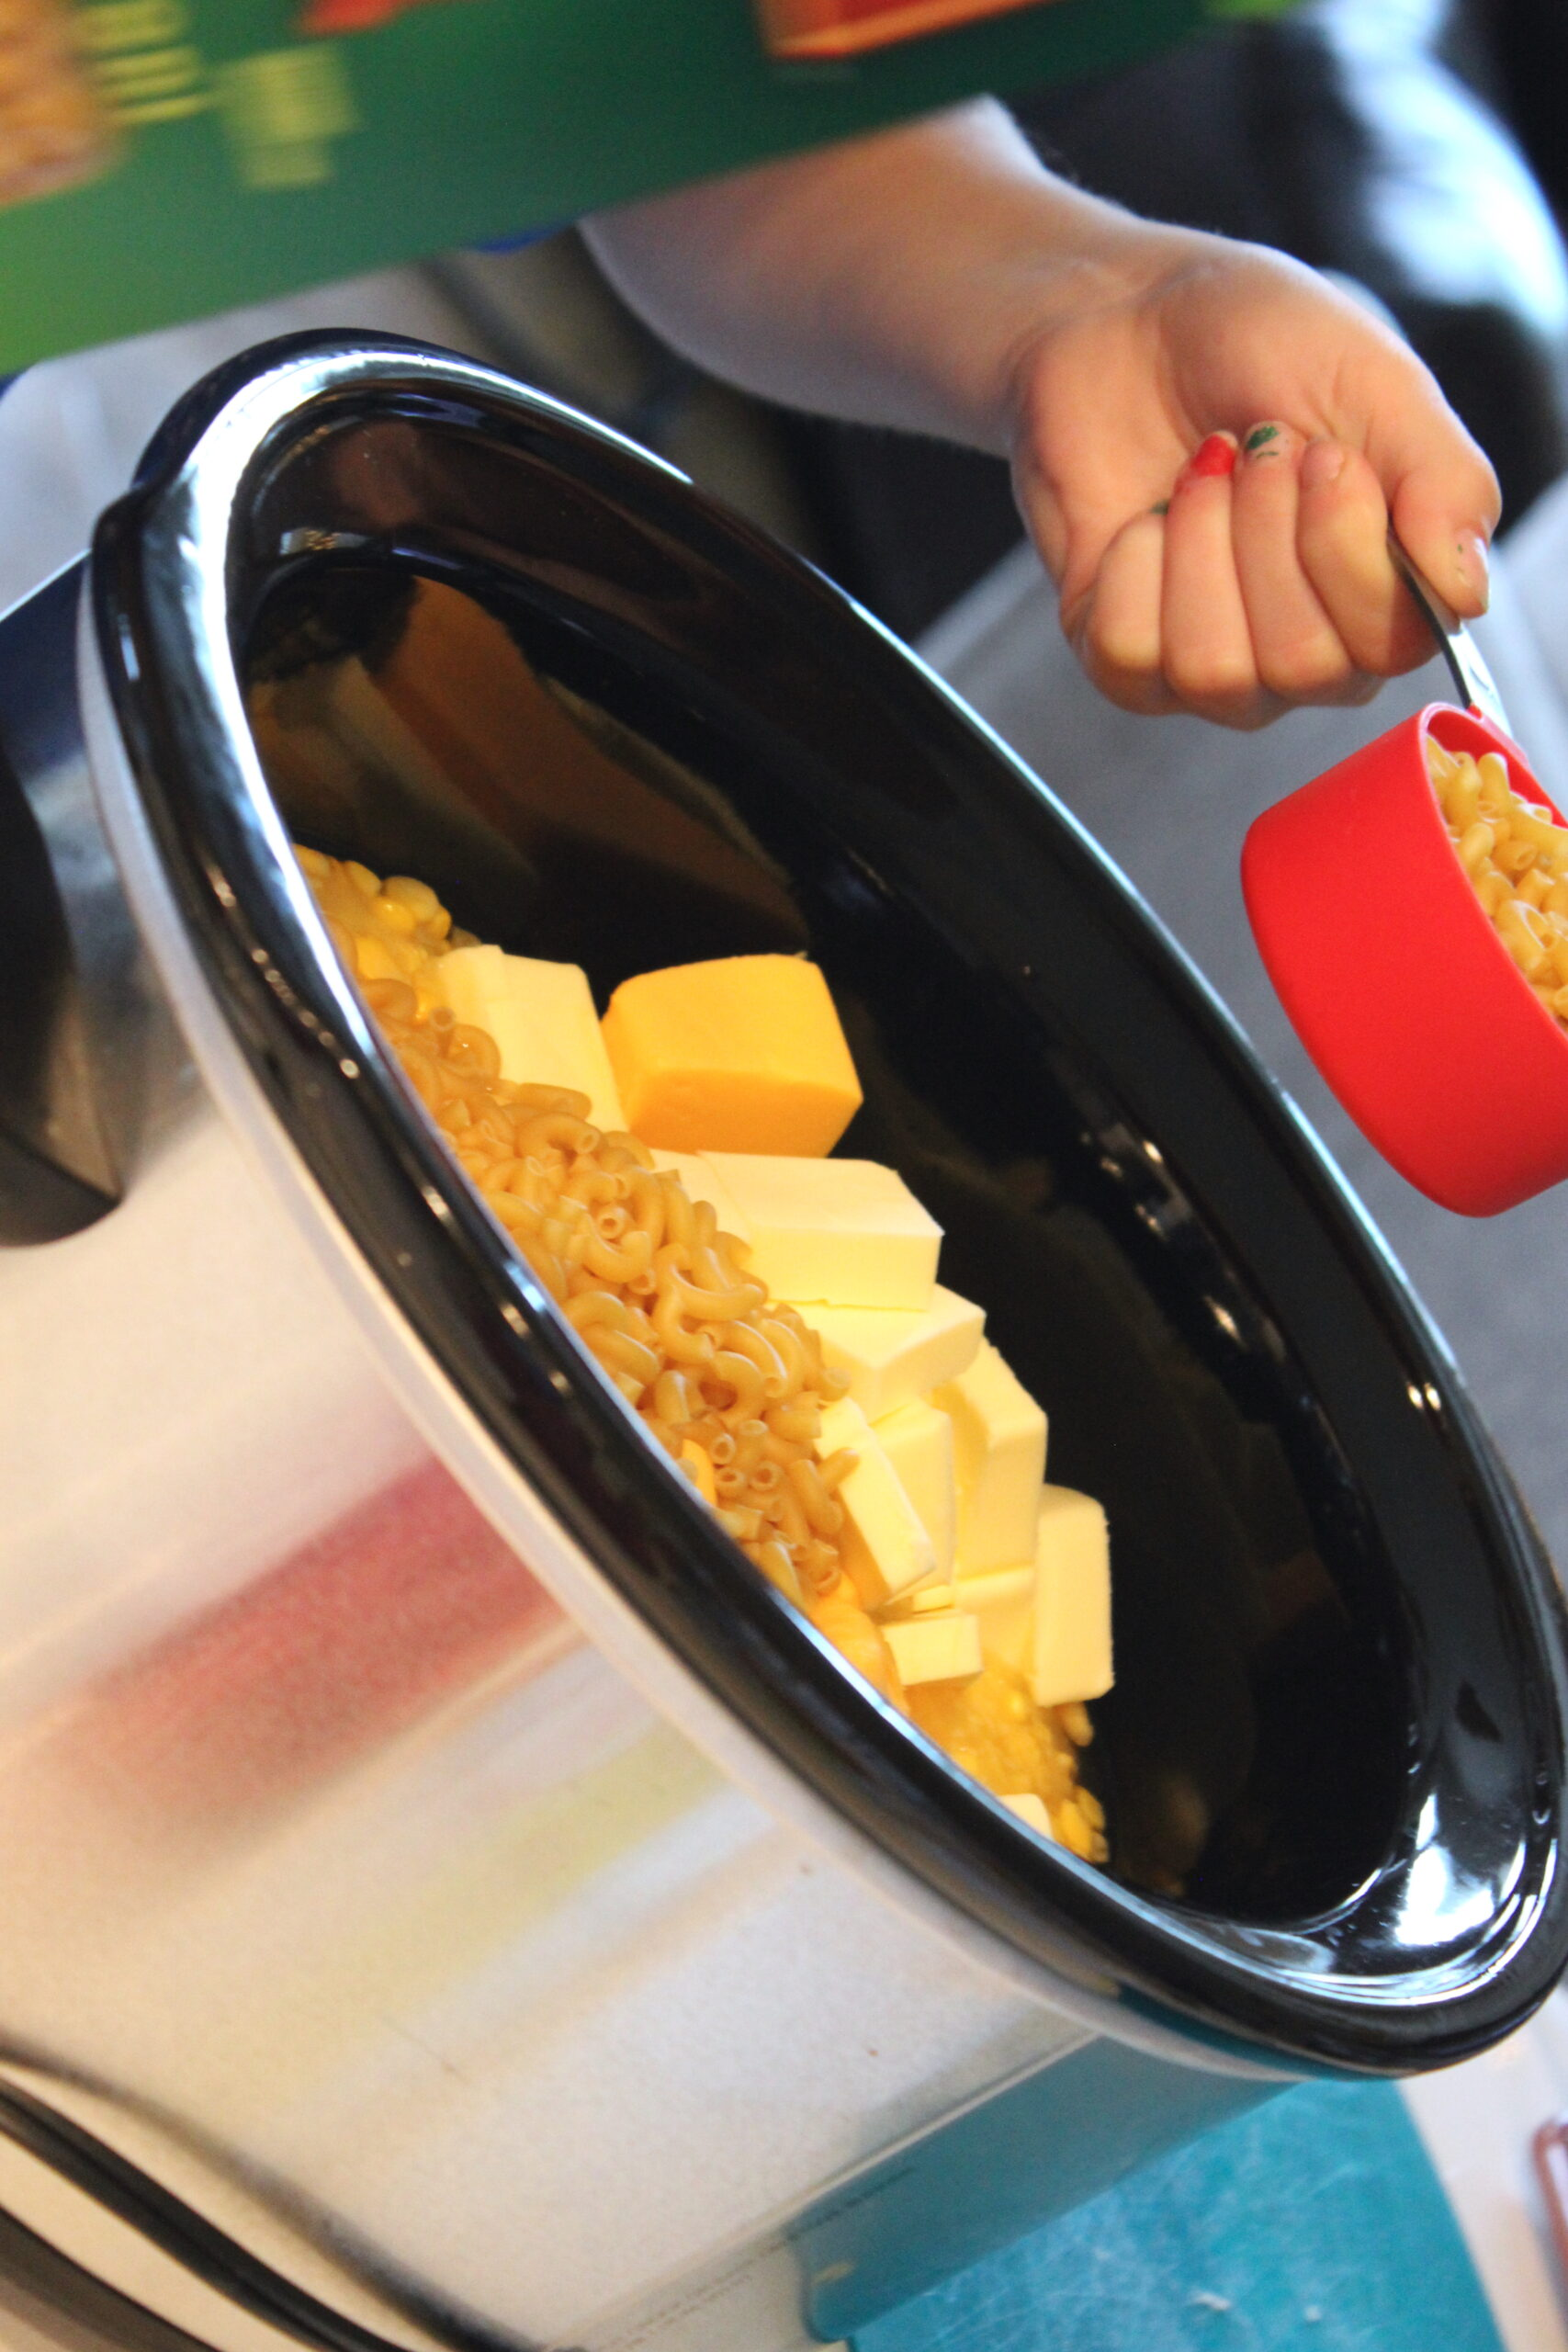 girl putting macaroni into crock pot